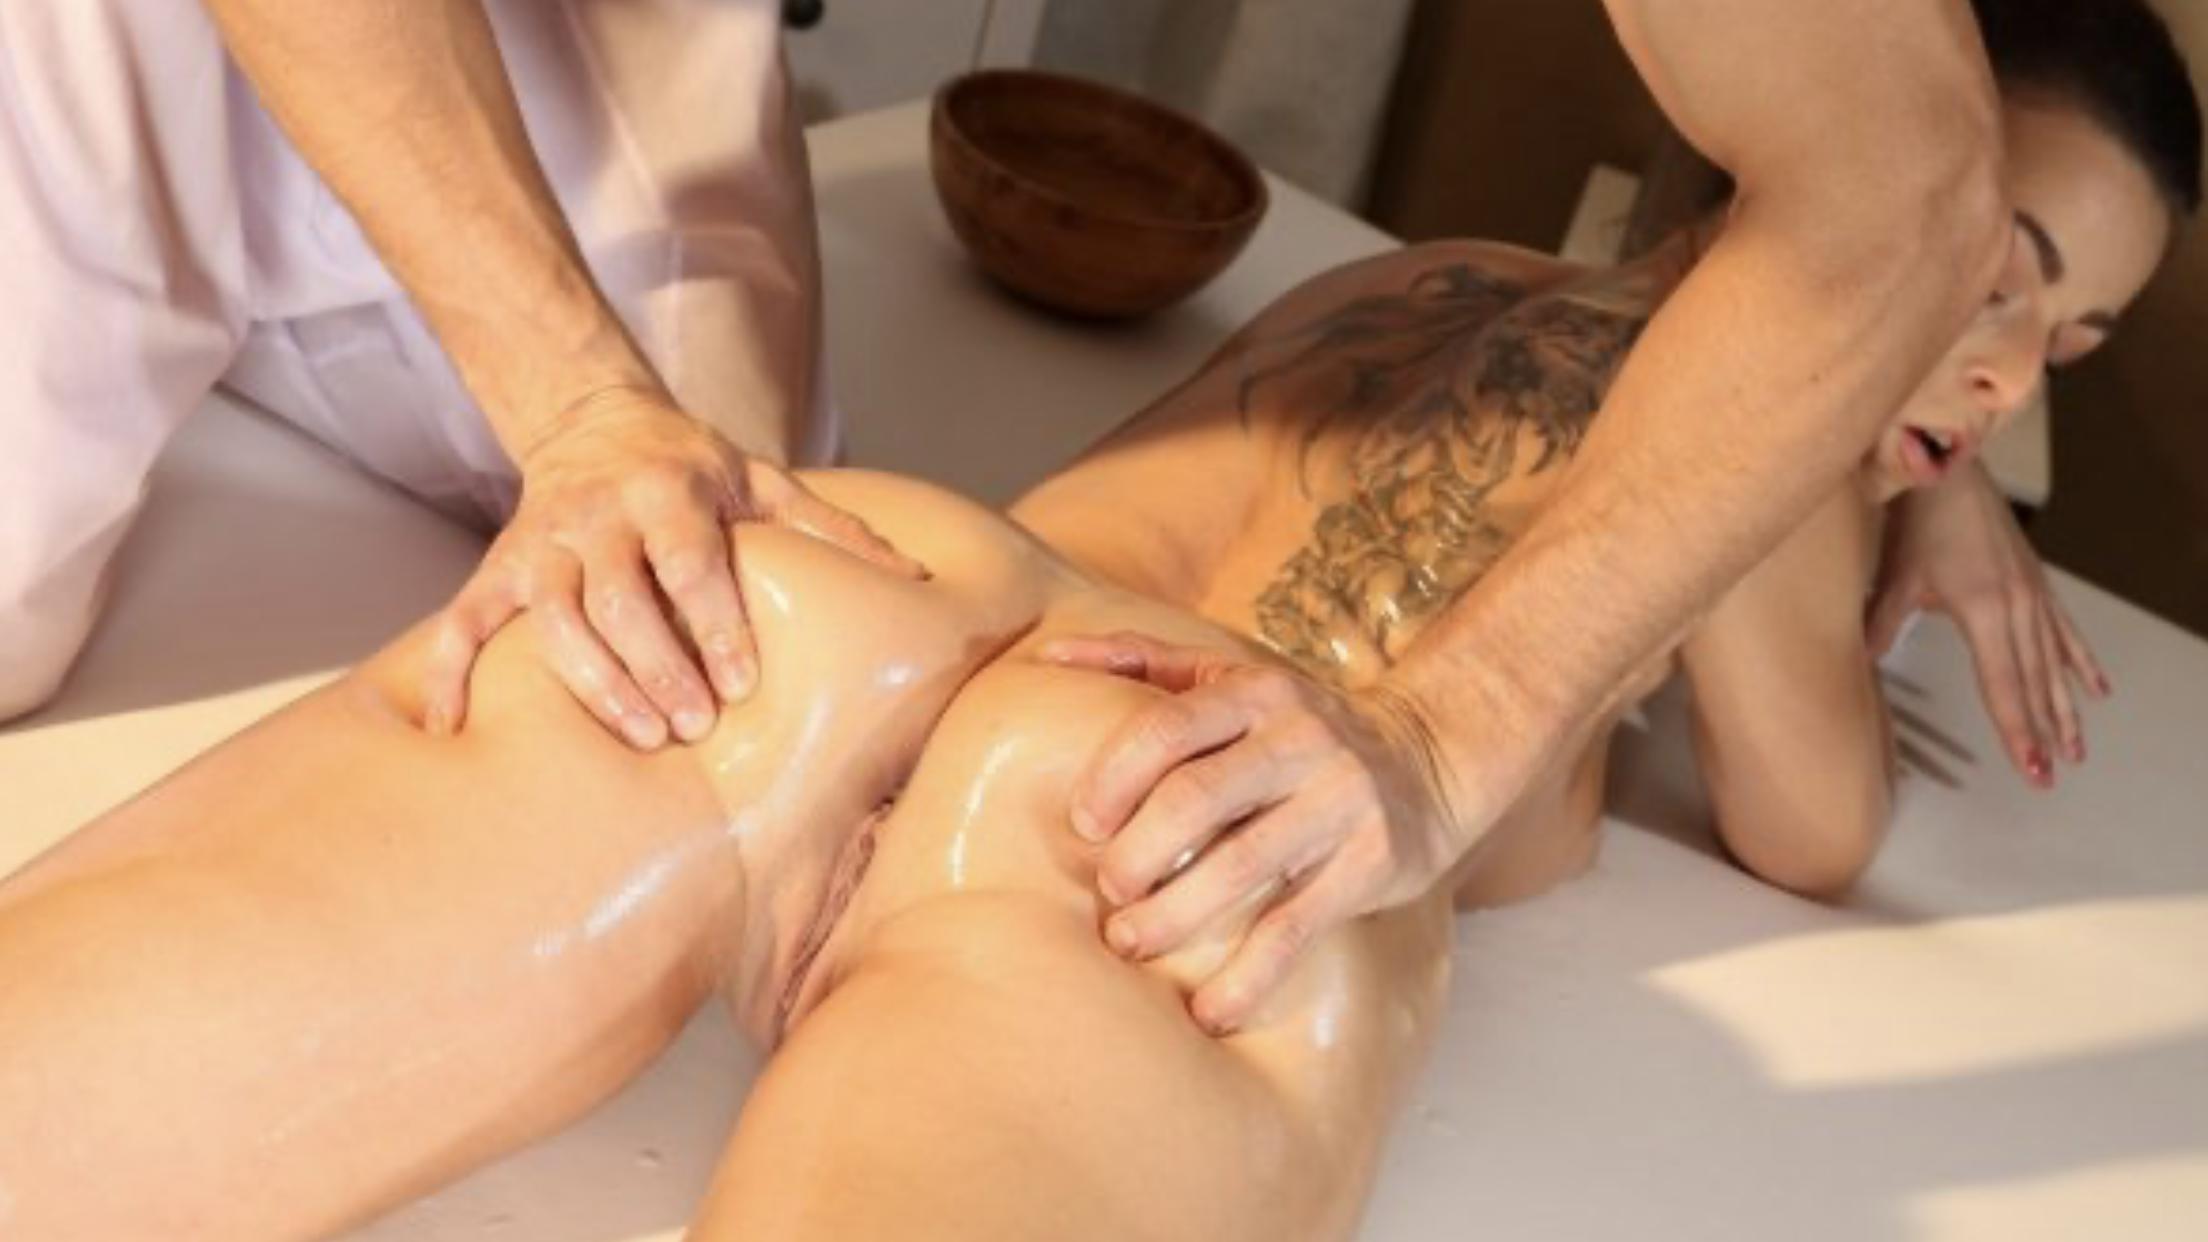 Categories Sluts, Hookup Find, Nude Massage